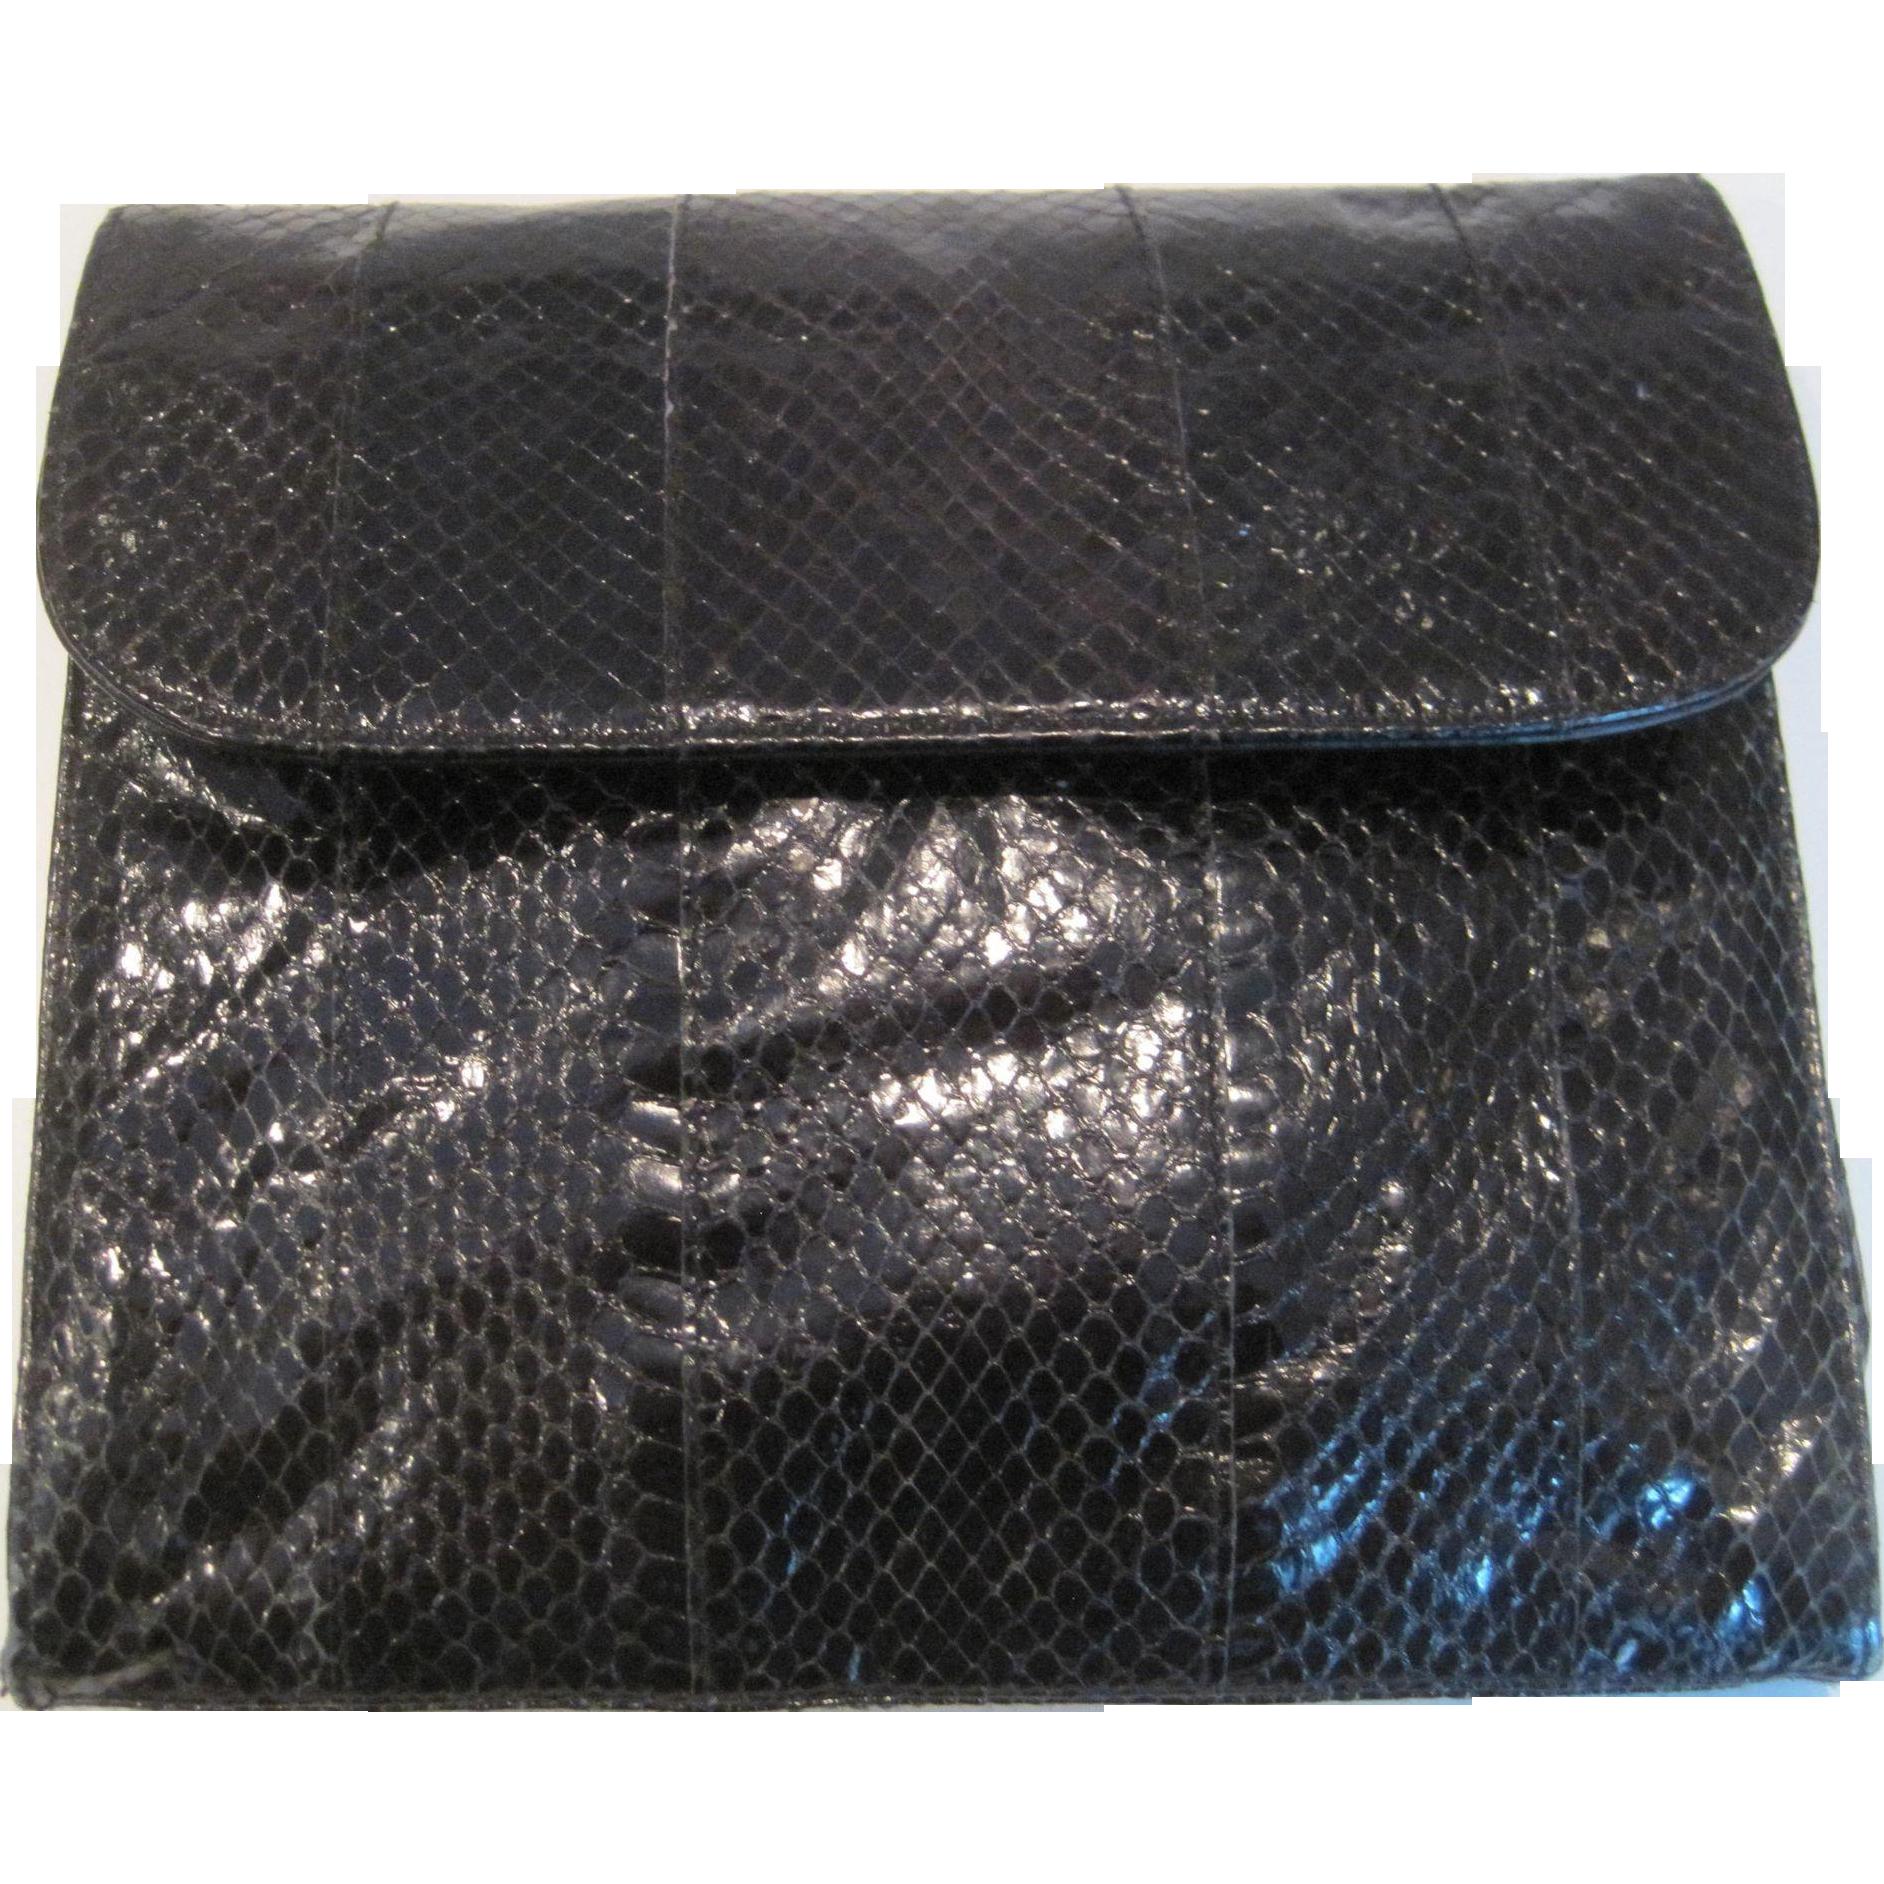 Vintage hasting & smith black snakeskin purse